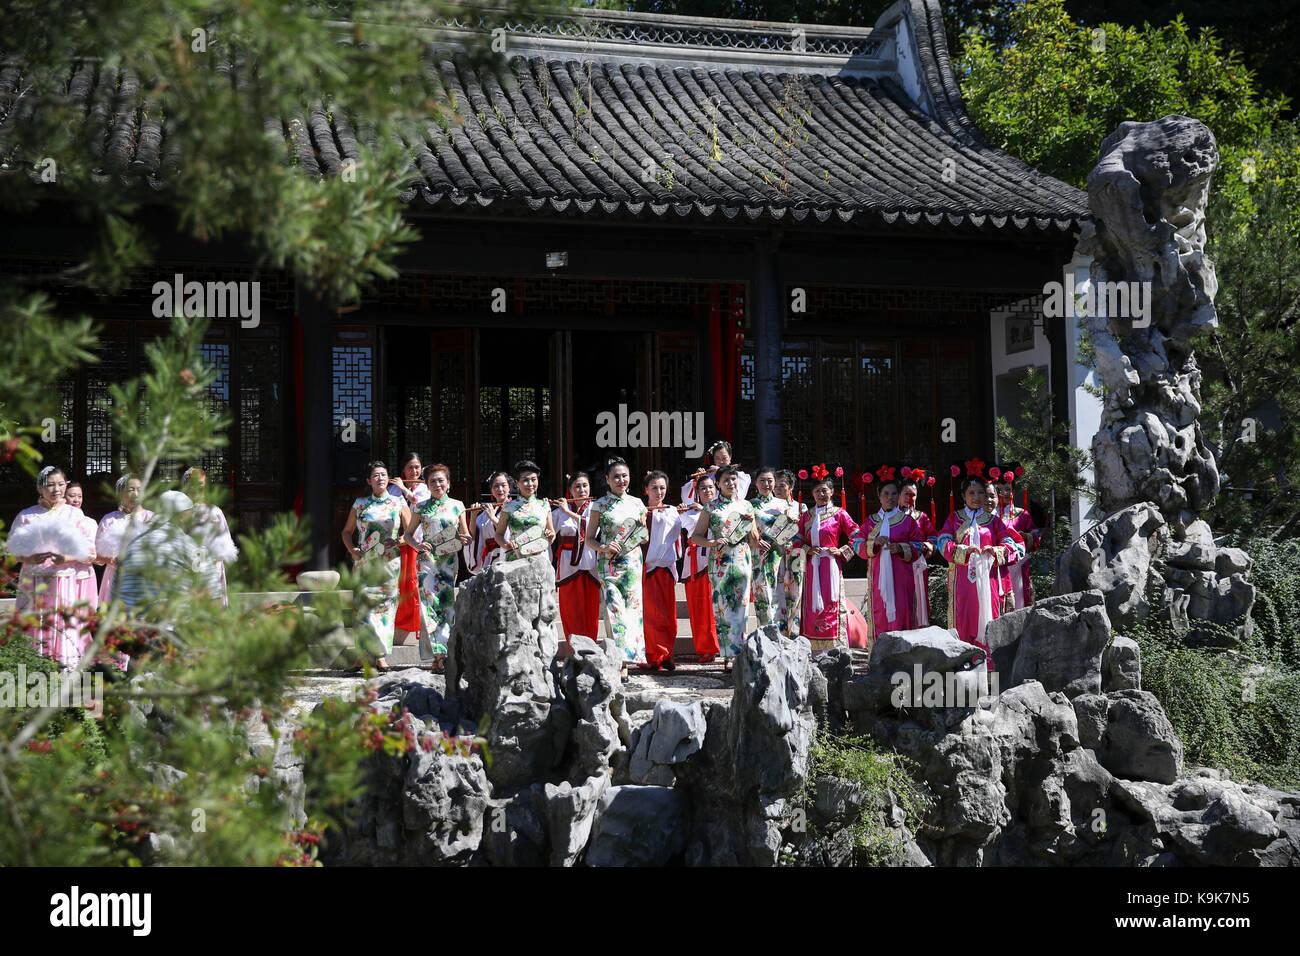 Chinese scholars garden stock photos chinese scholars garden stock images alamy for New york chinese scholar s garden